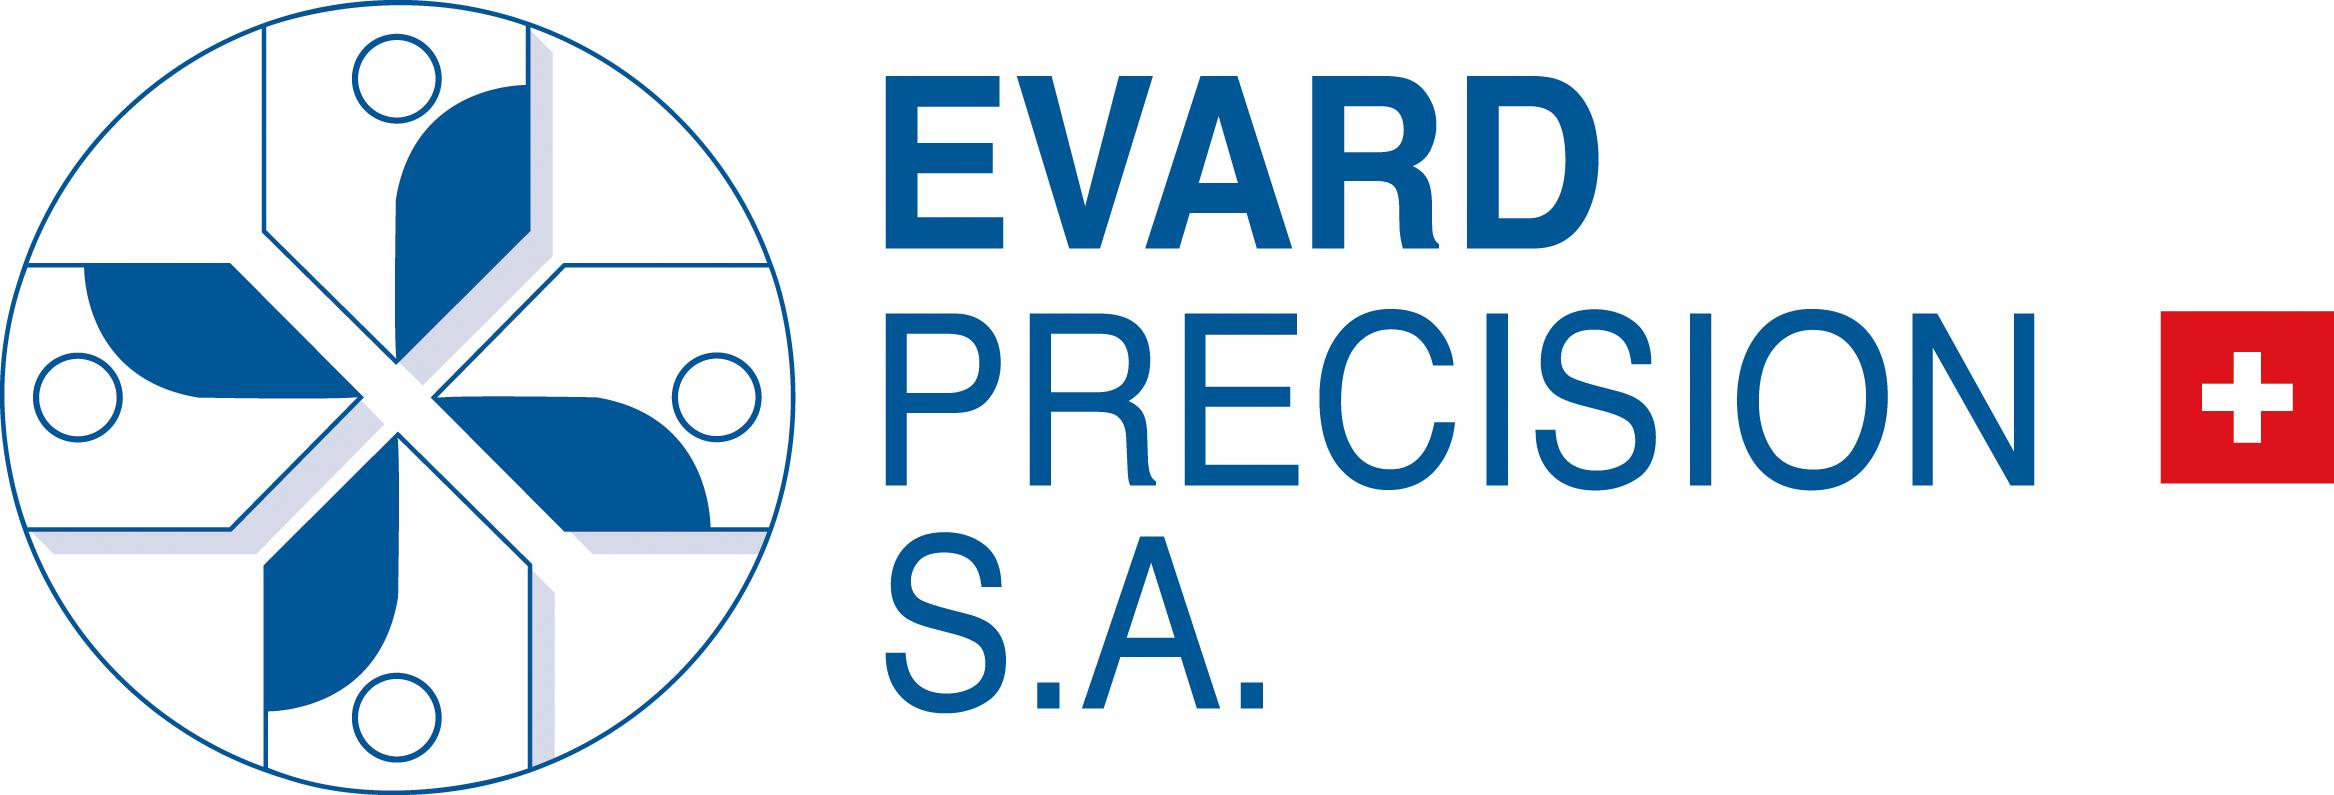 EVARD Precision SA